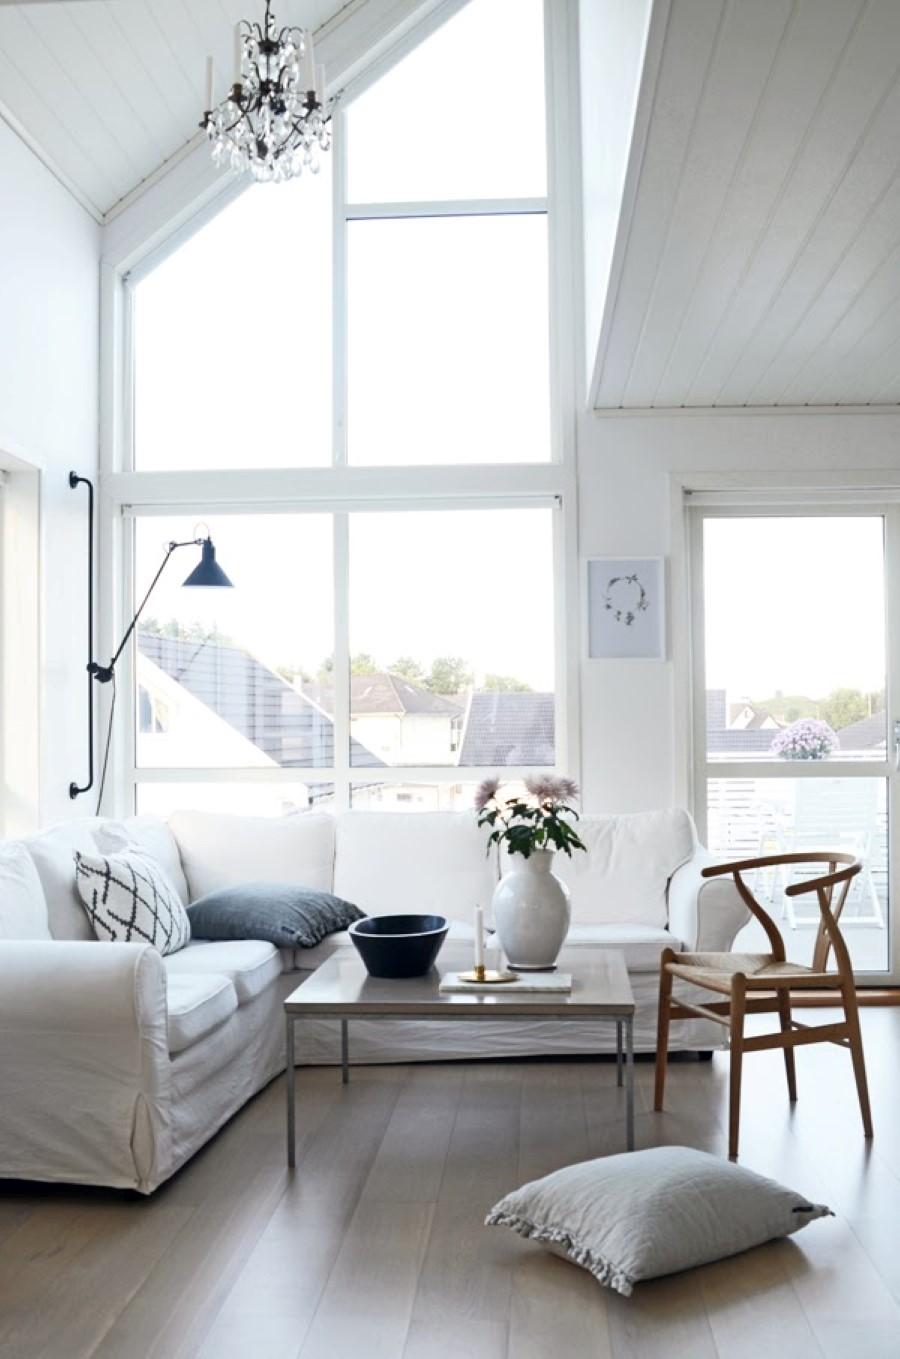 Interior Design Living Room Photos: Enrich Your Interior With Casual Scandinavian Style